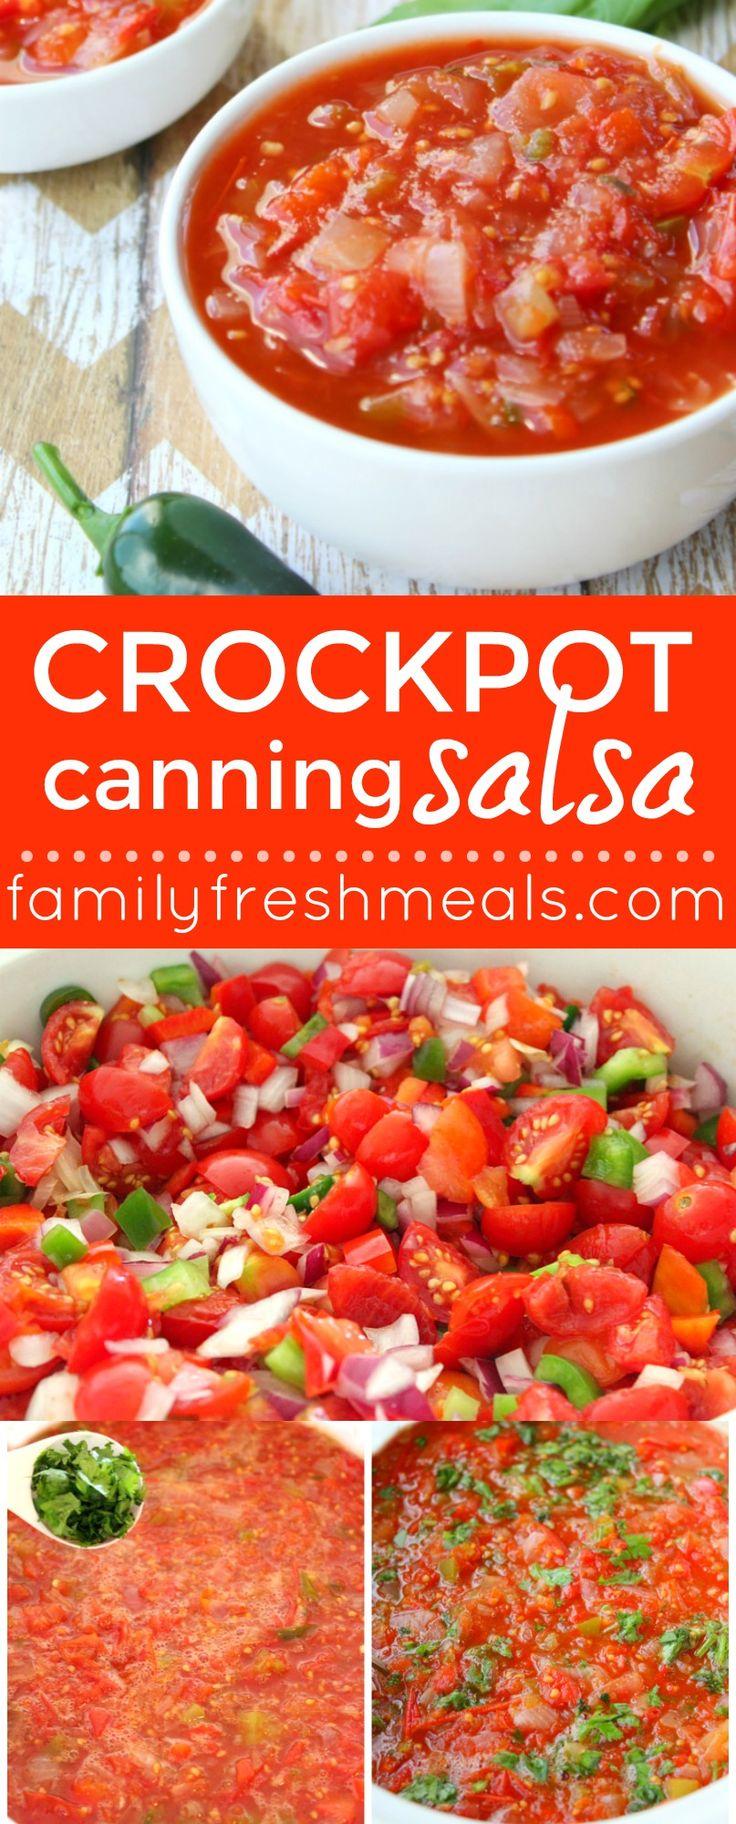 Crockpot Canning Salsa --- FamilyFreshMeals.com